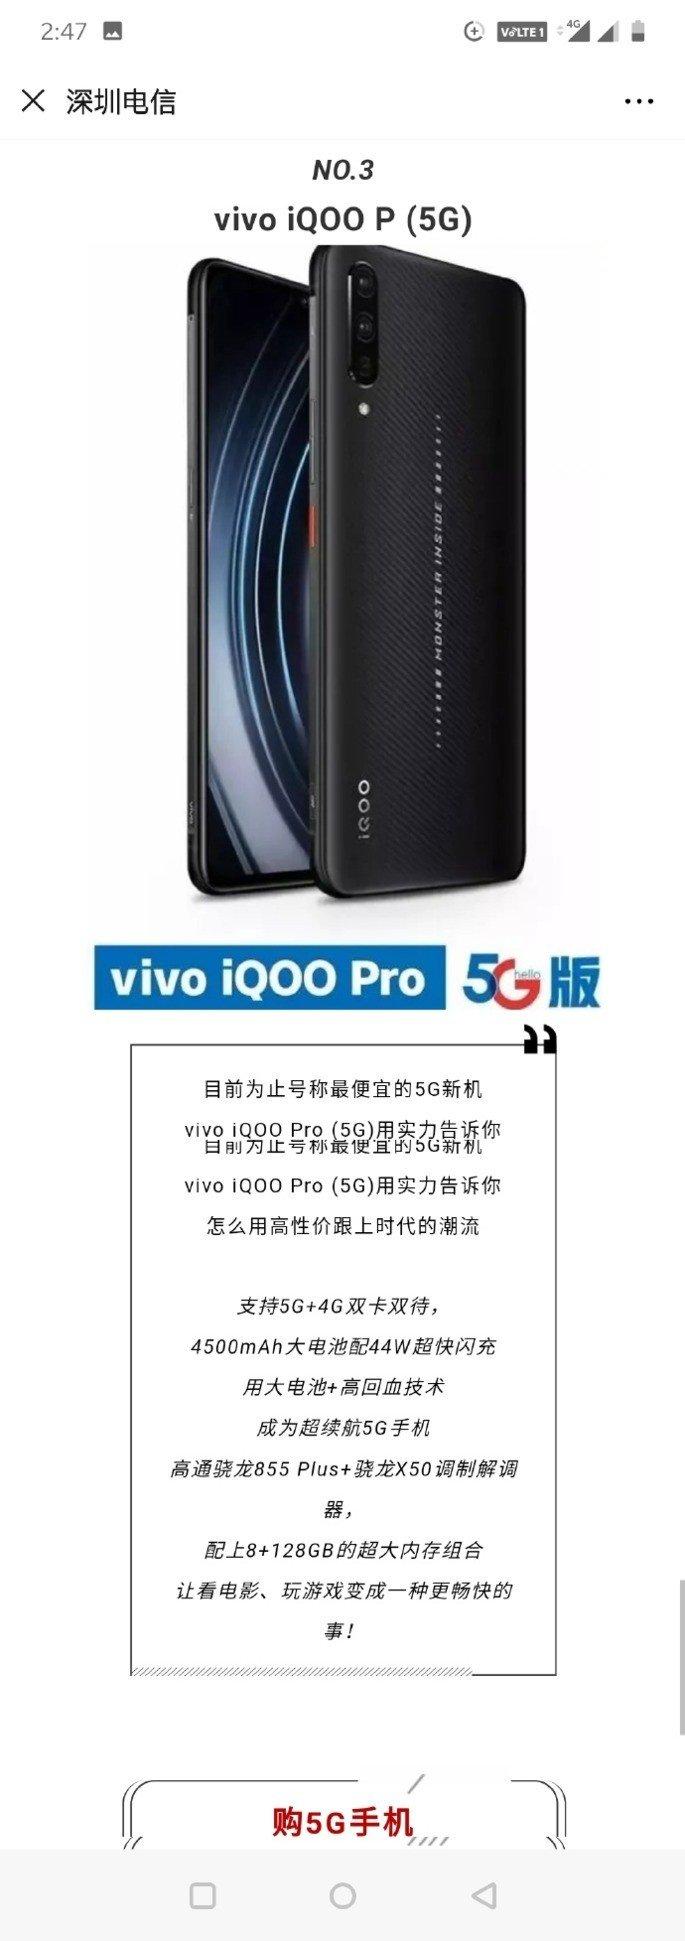 Vivo iQOO Pro 5G leak